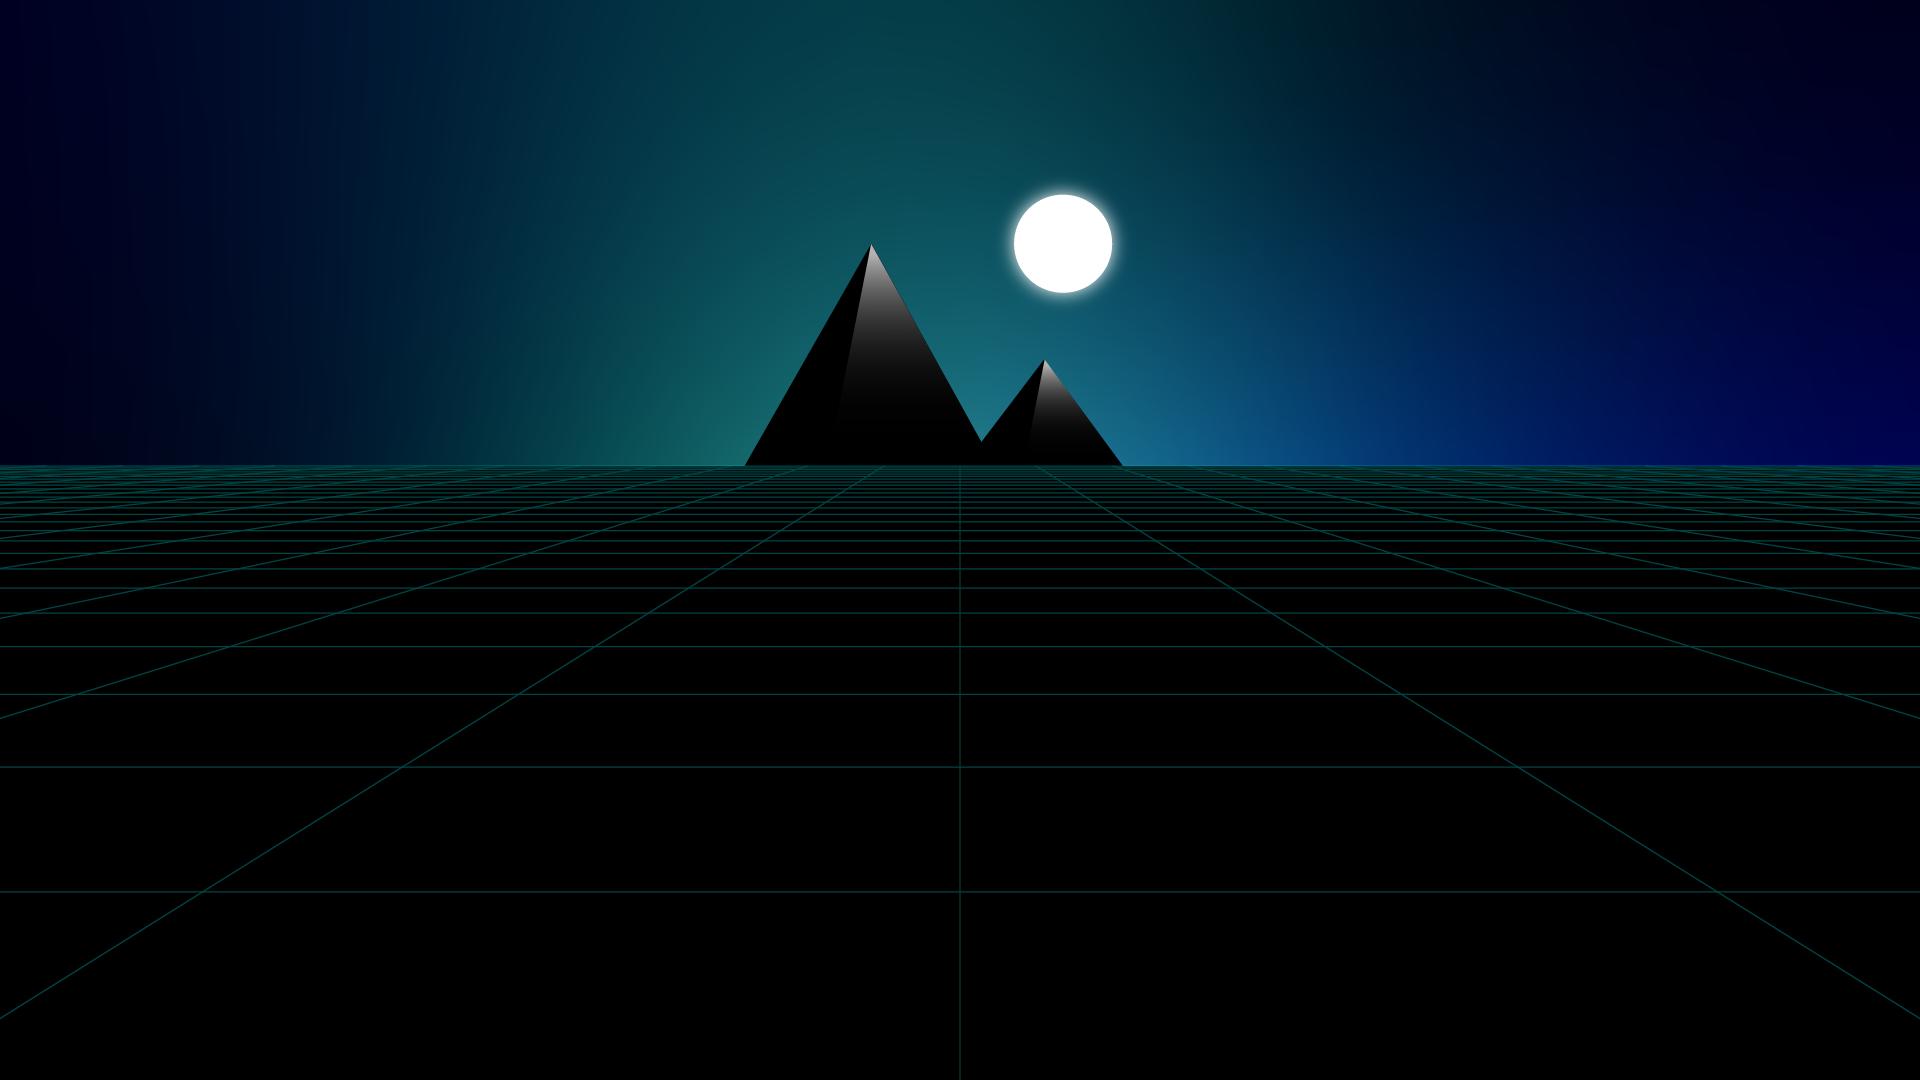 Wallpaper minimalist - Synthwave night in pyramids ...